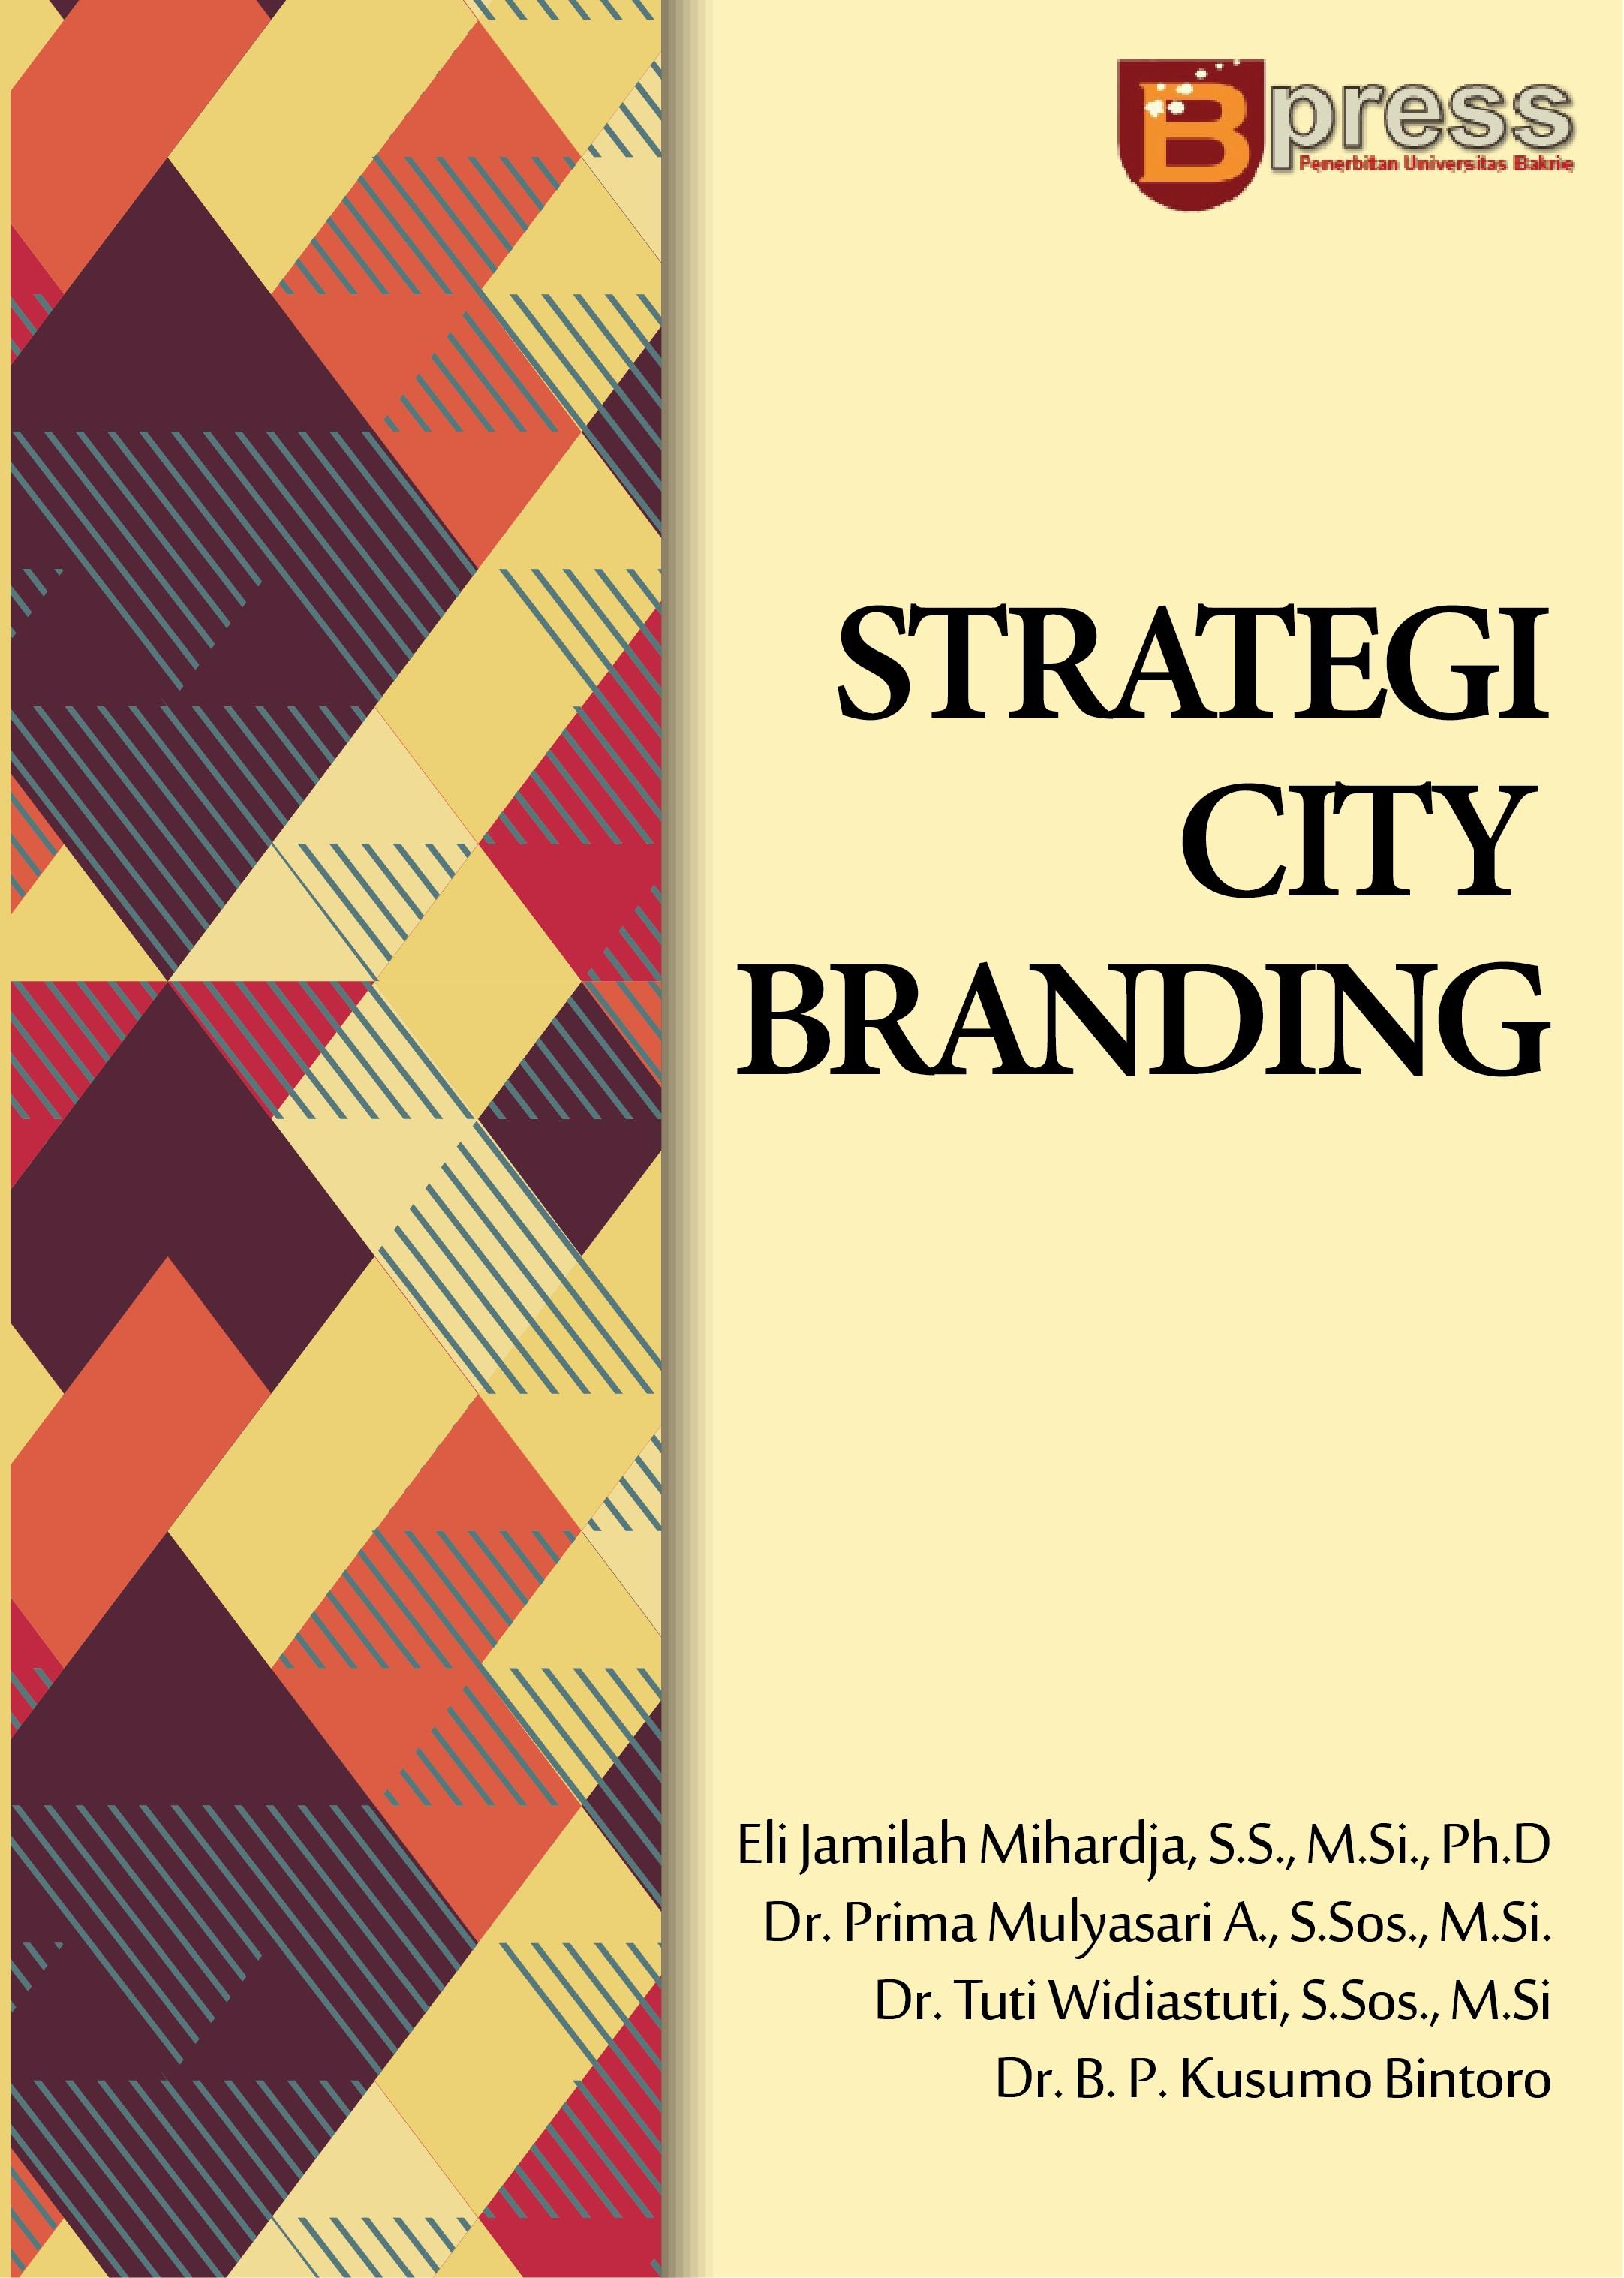 Strategi city branding [sumber elektronis]